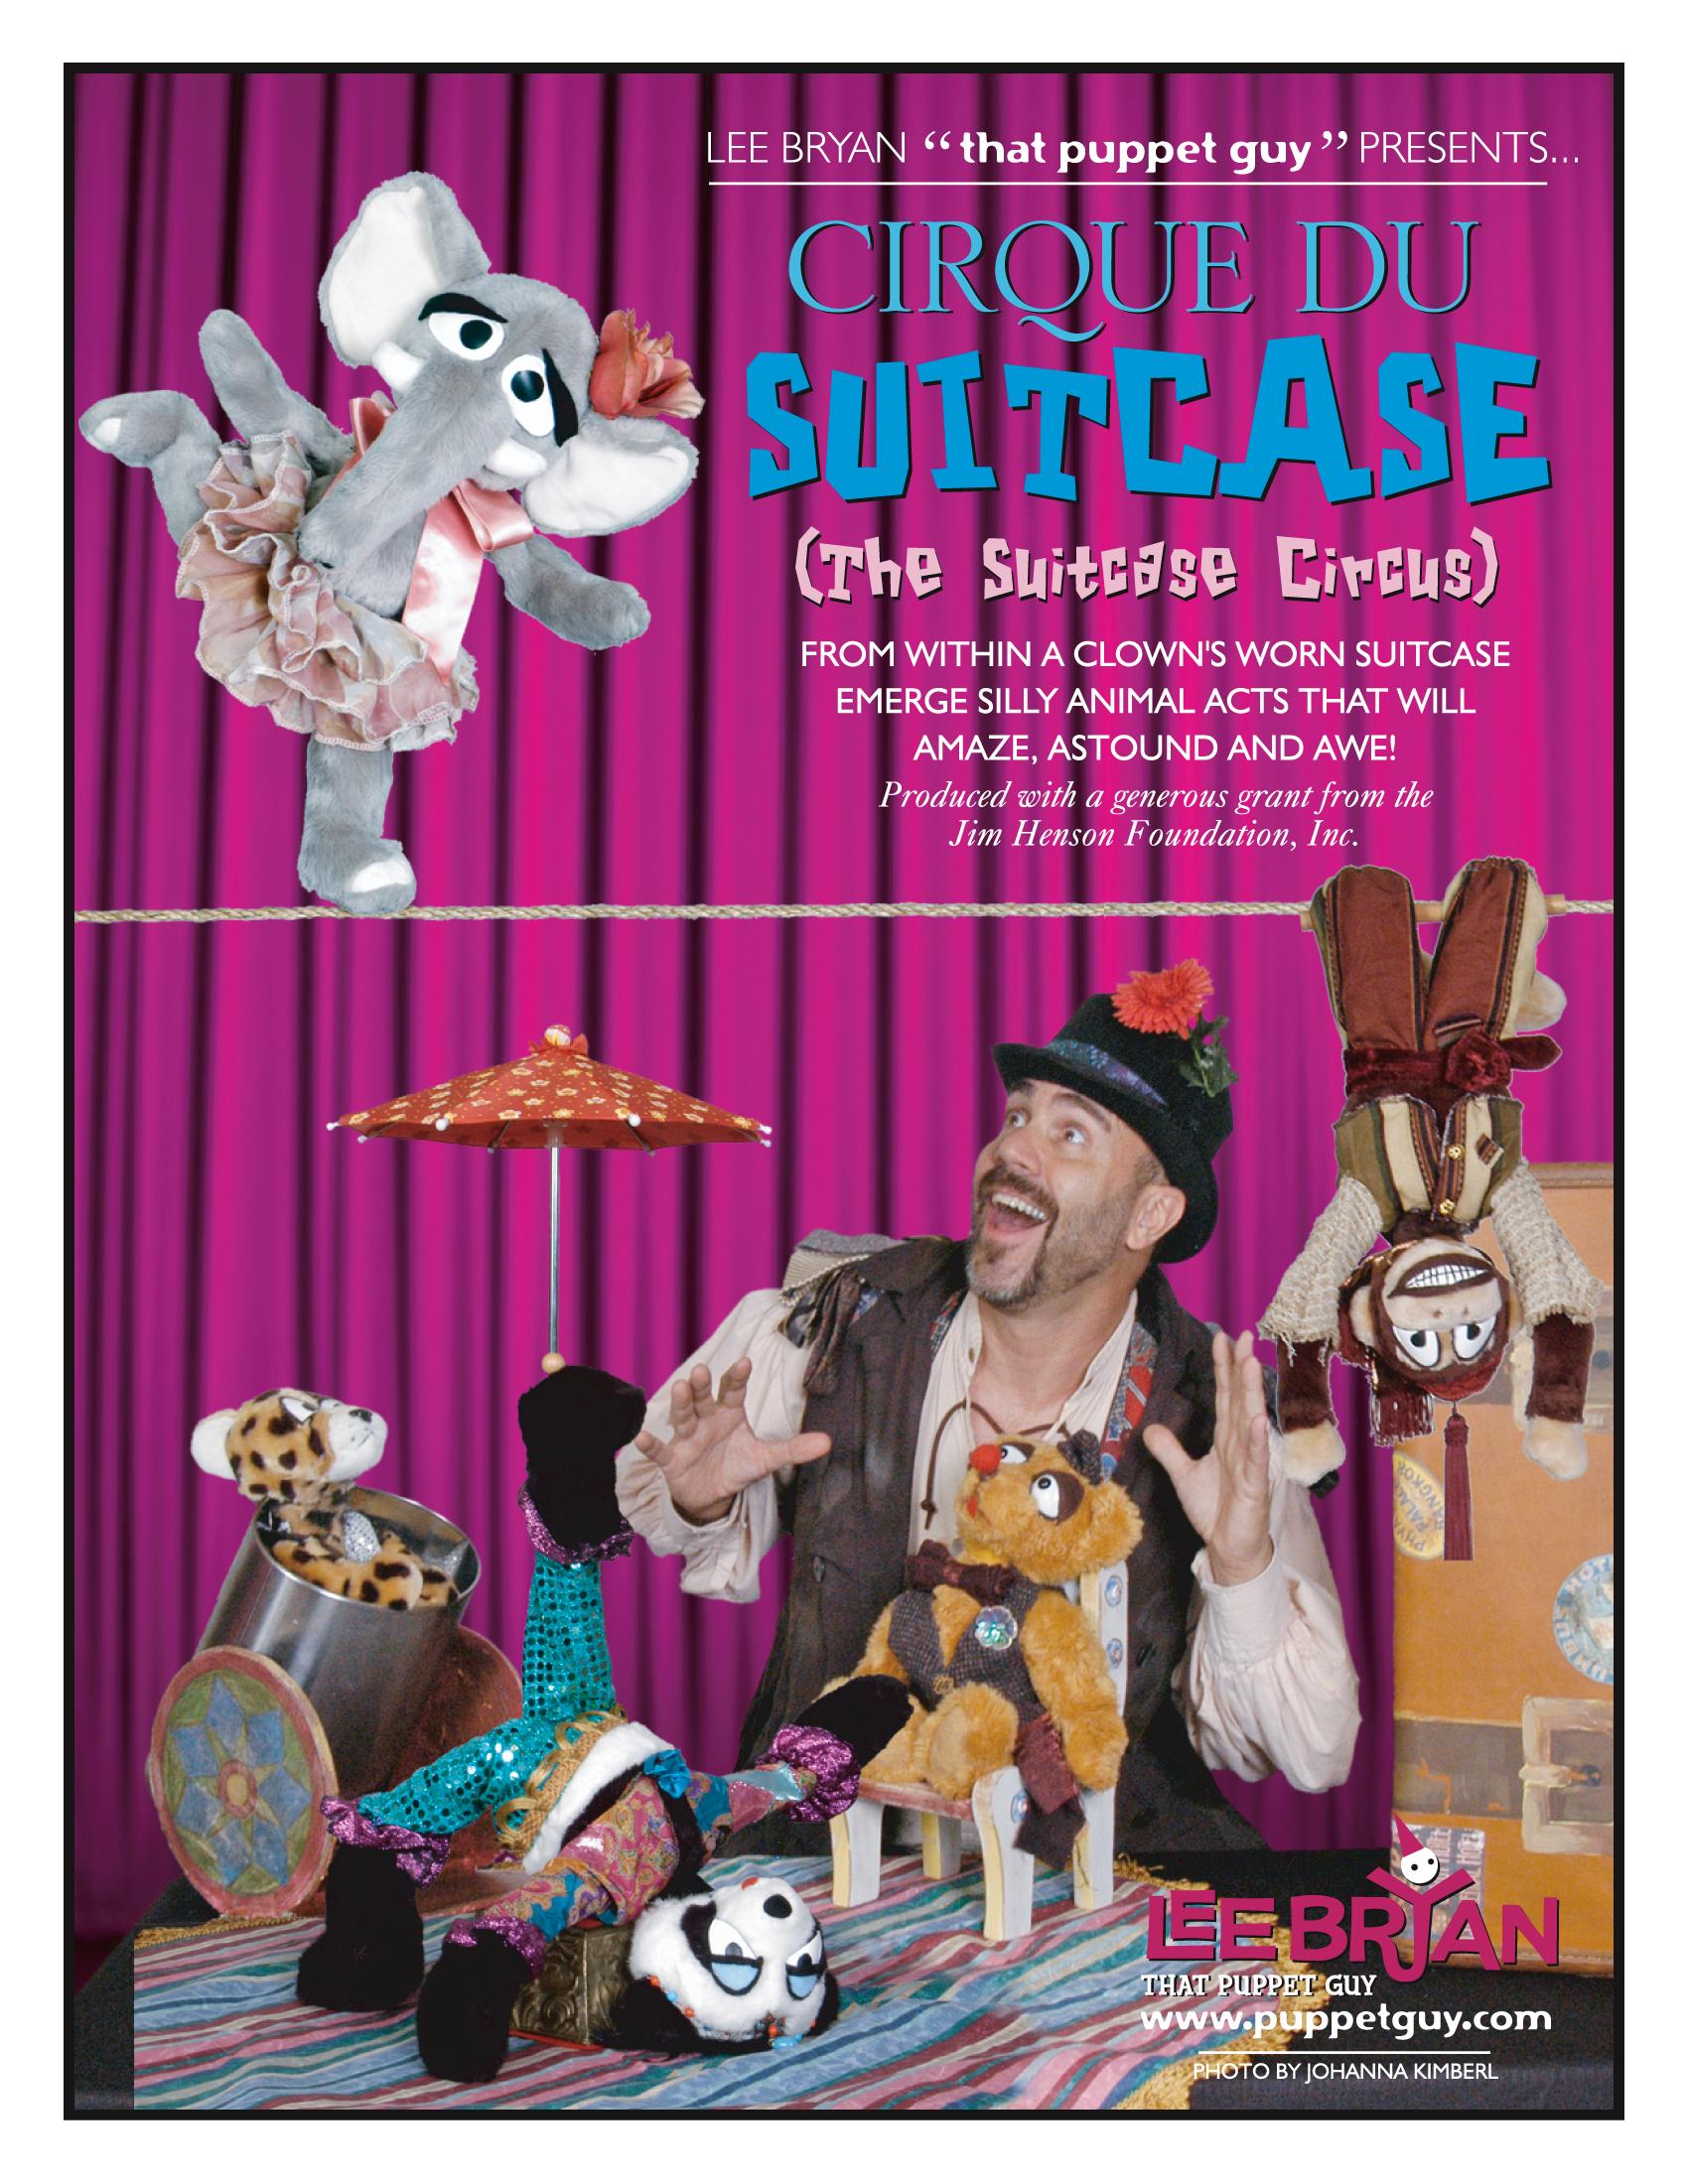 Publicity Slick The Suitcase Circus